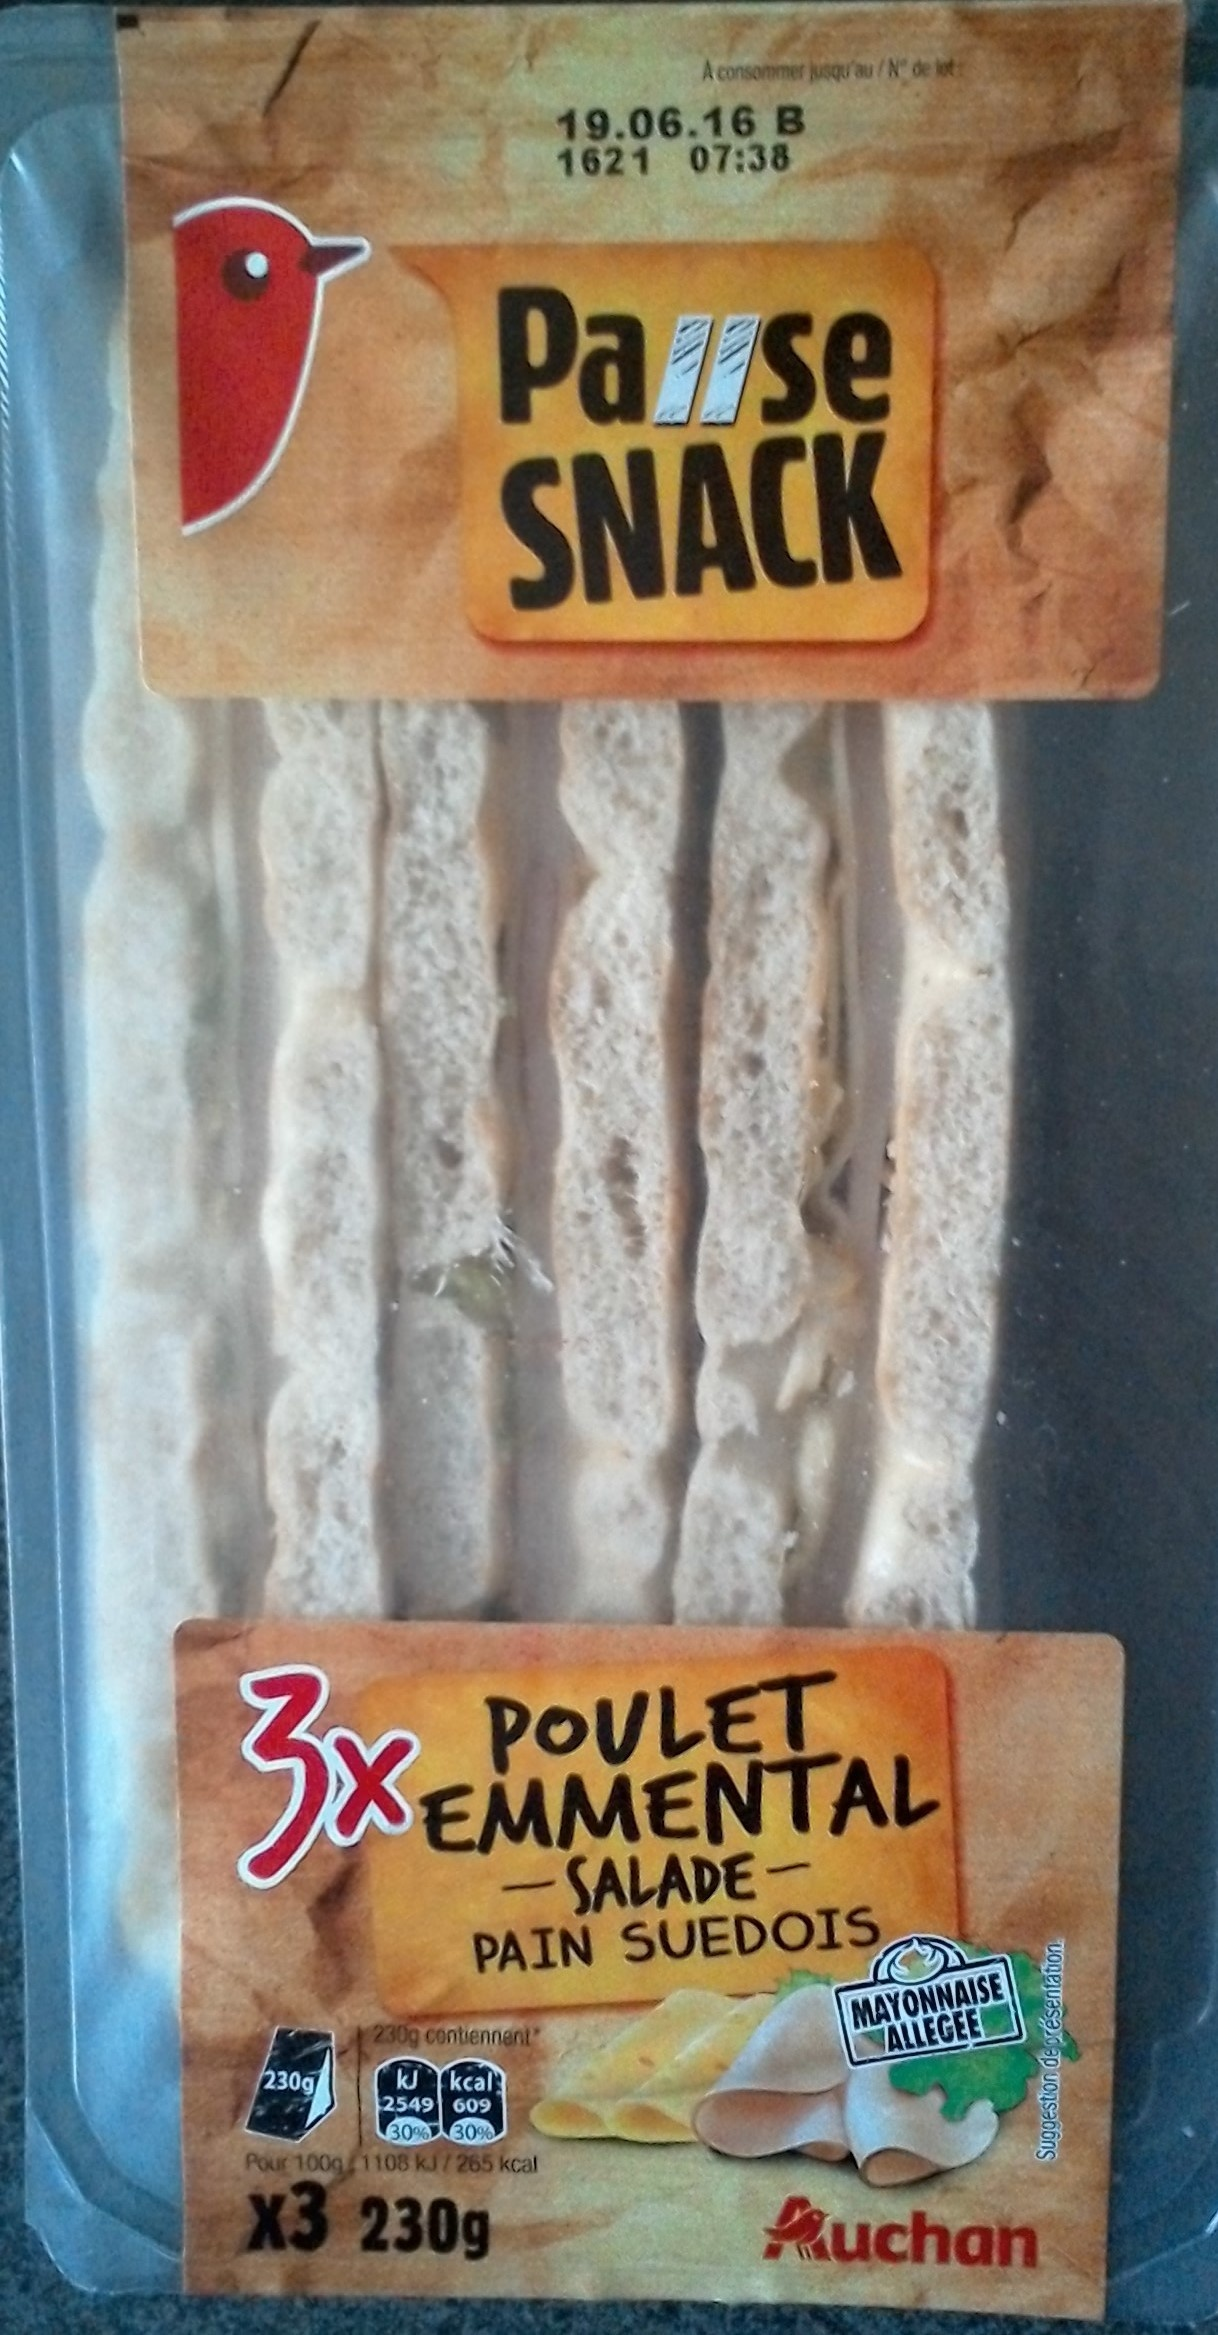 Pause snack 3x Poulets emmental - salade - pain suédois - Product